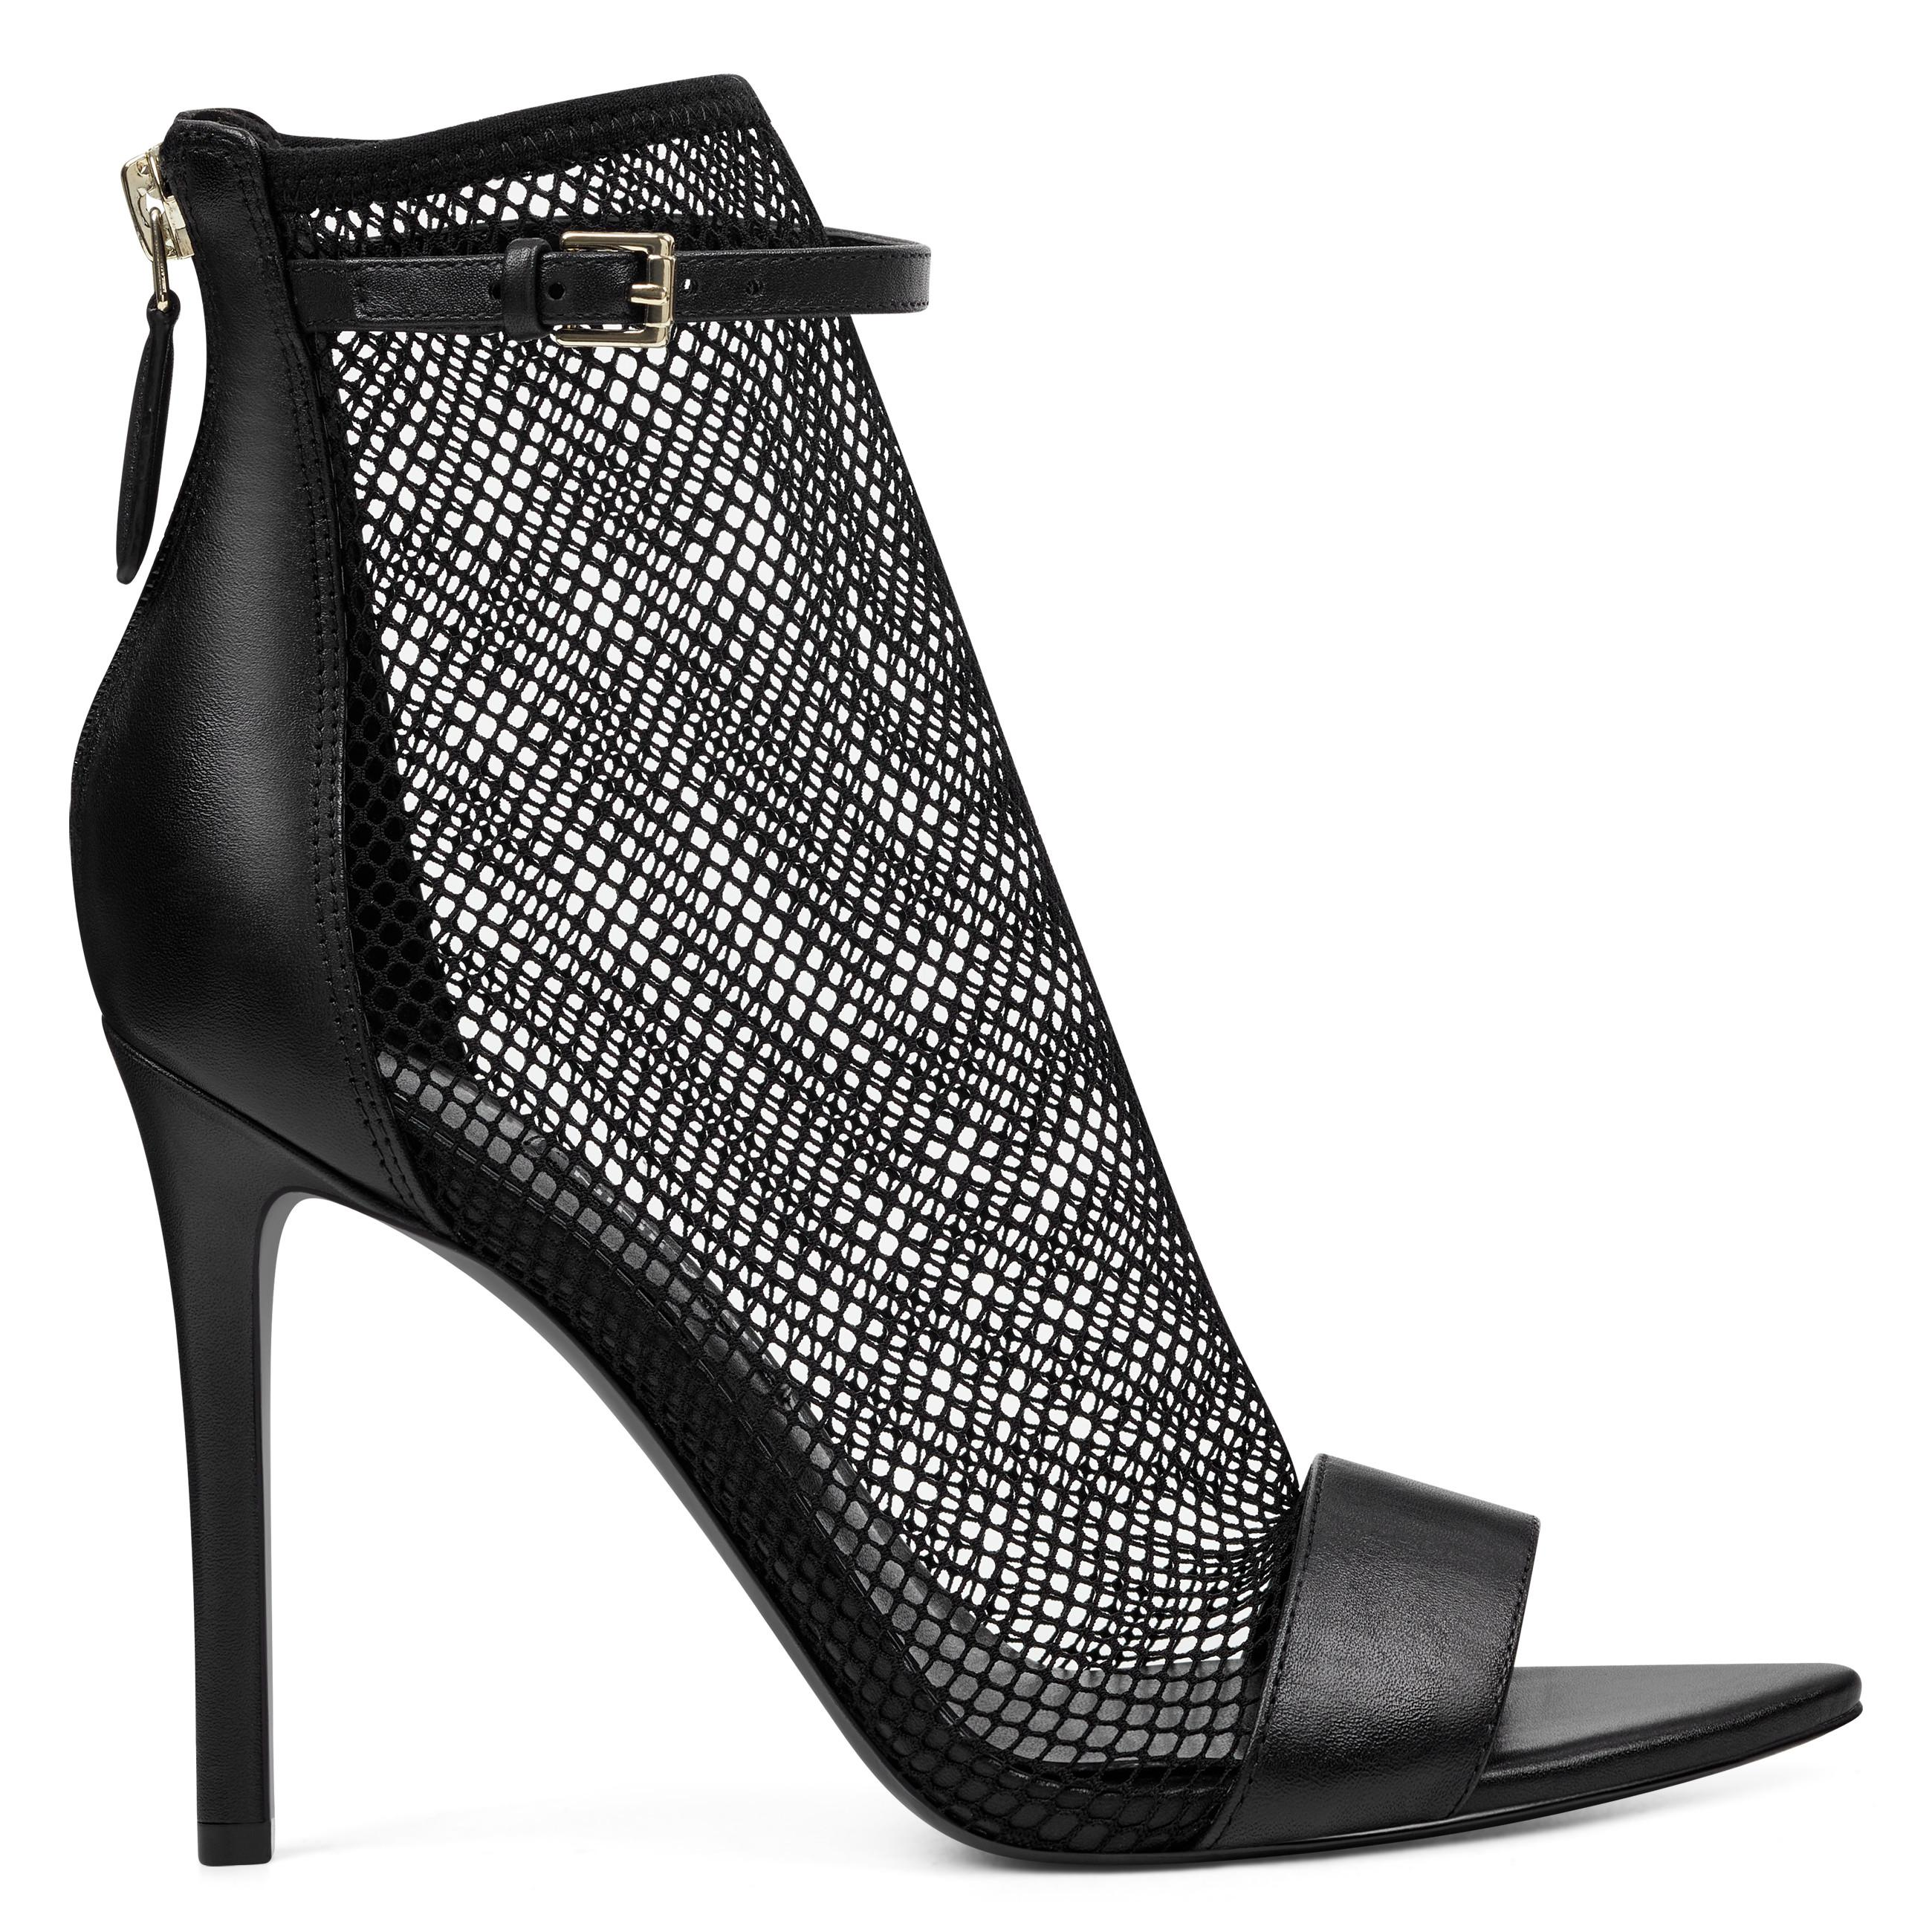 e84666234a463b Lyst - Nine West Gotbank Mesh Dress Sandals in Black - Save 64%